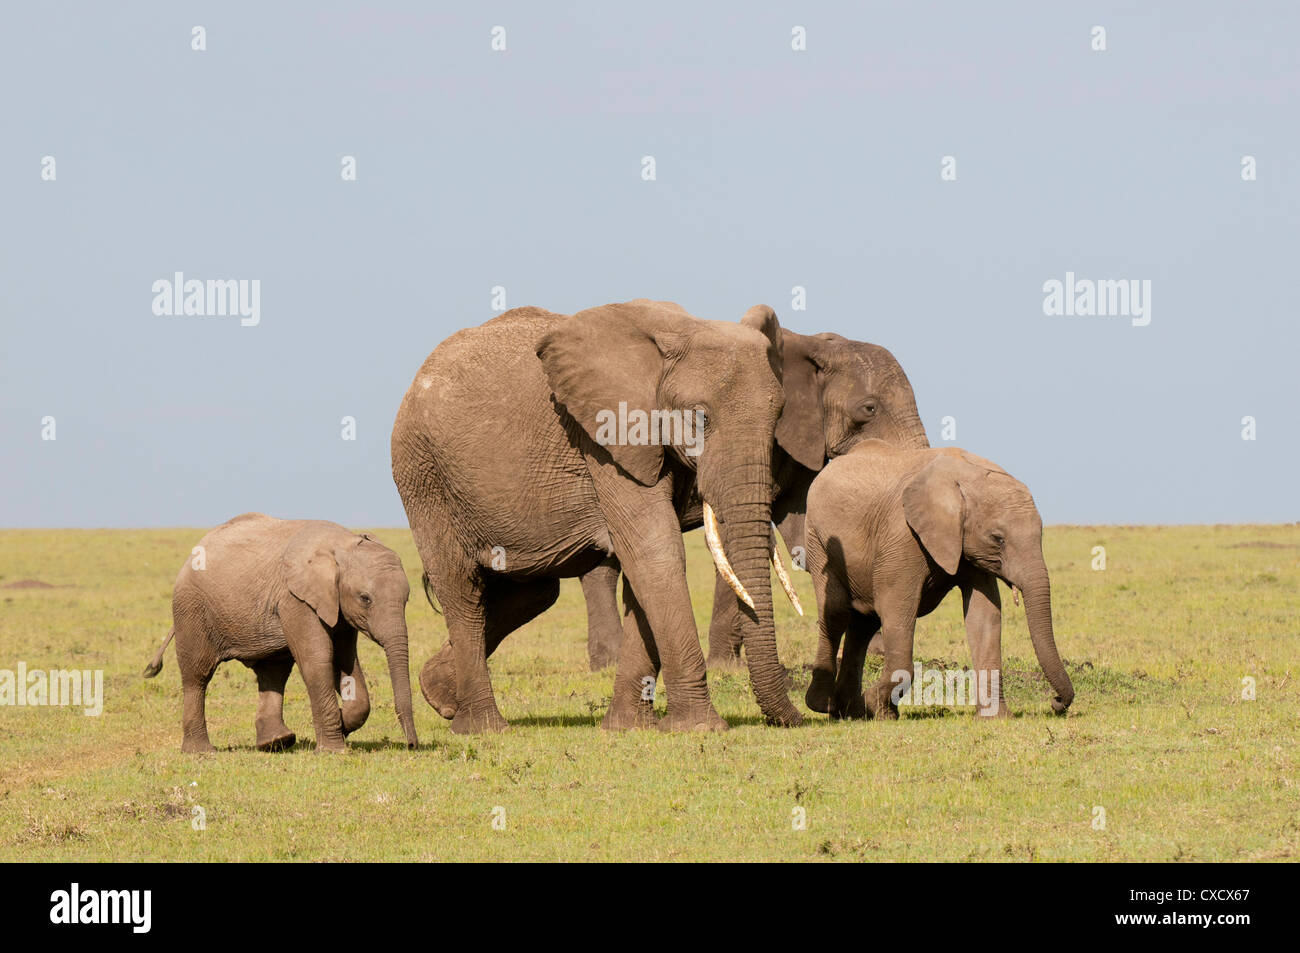 African elephant (Loxodonta africana), Masai Mara, Kenya, East Africa, Africa - Stock Image